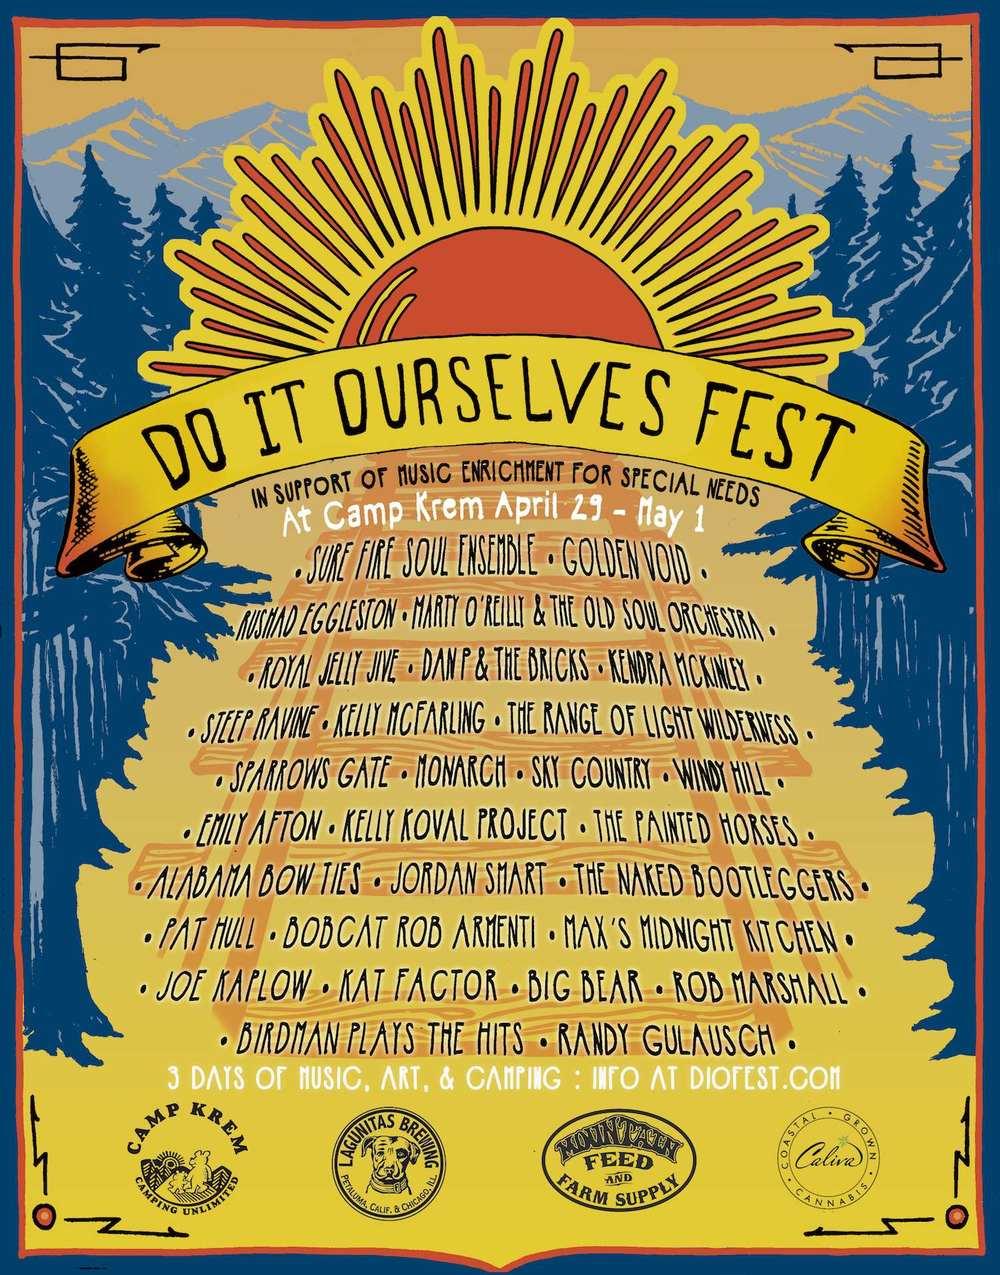 Poster art by lucaselmer.com